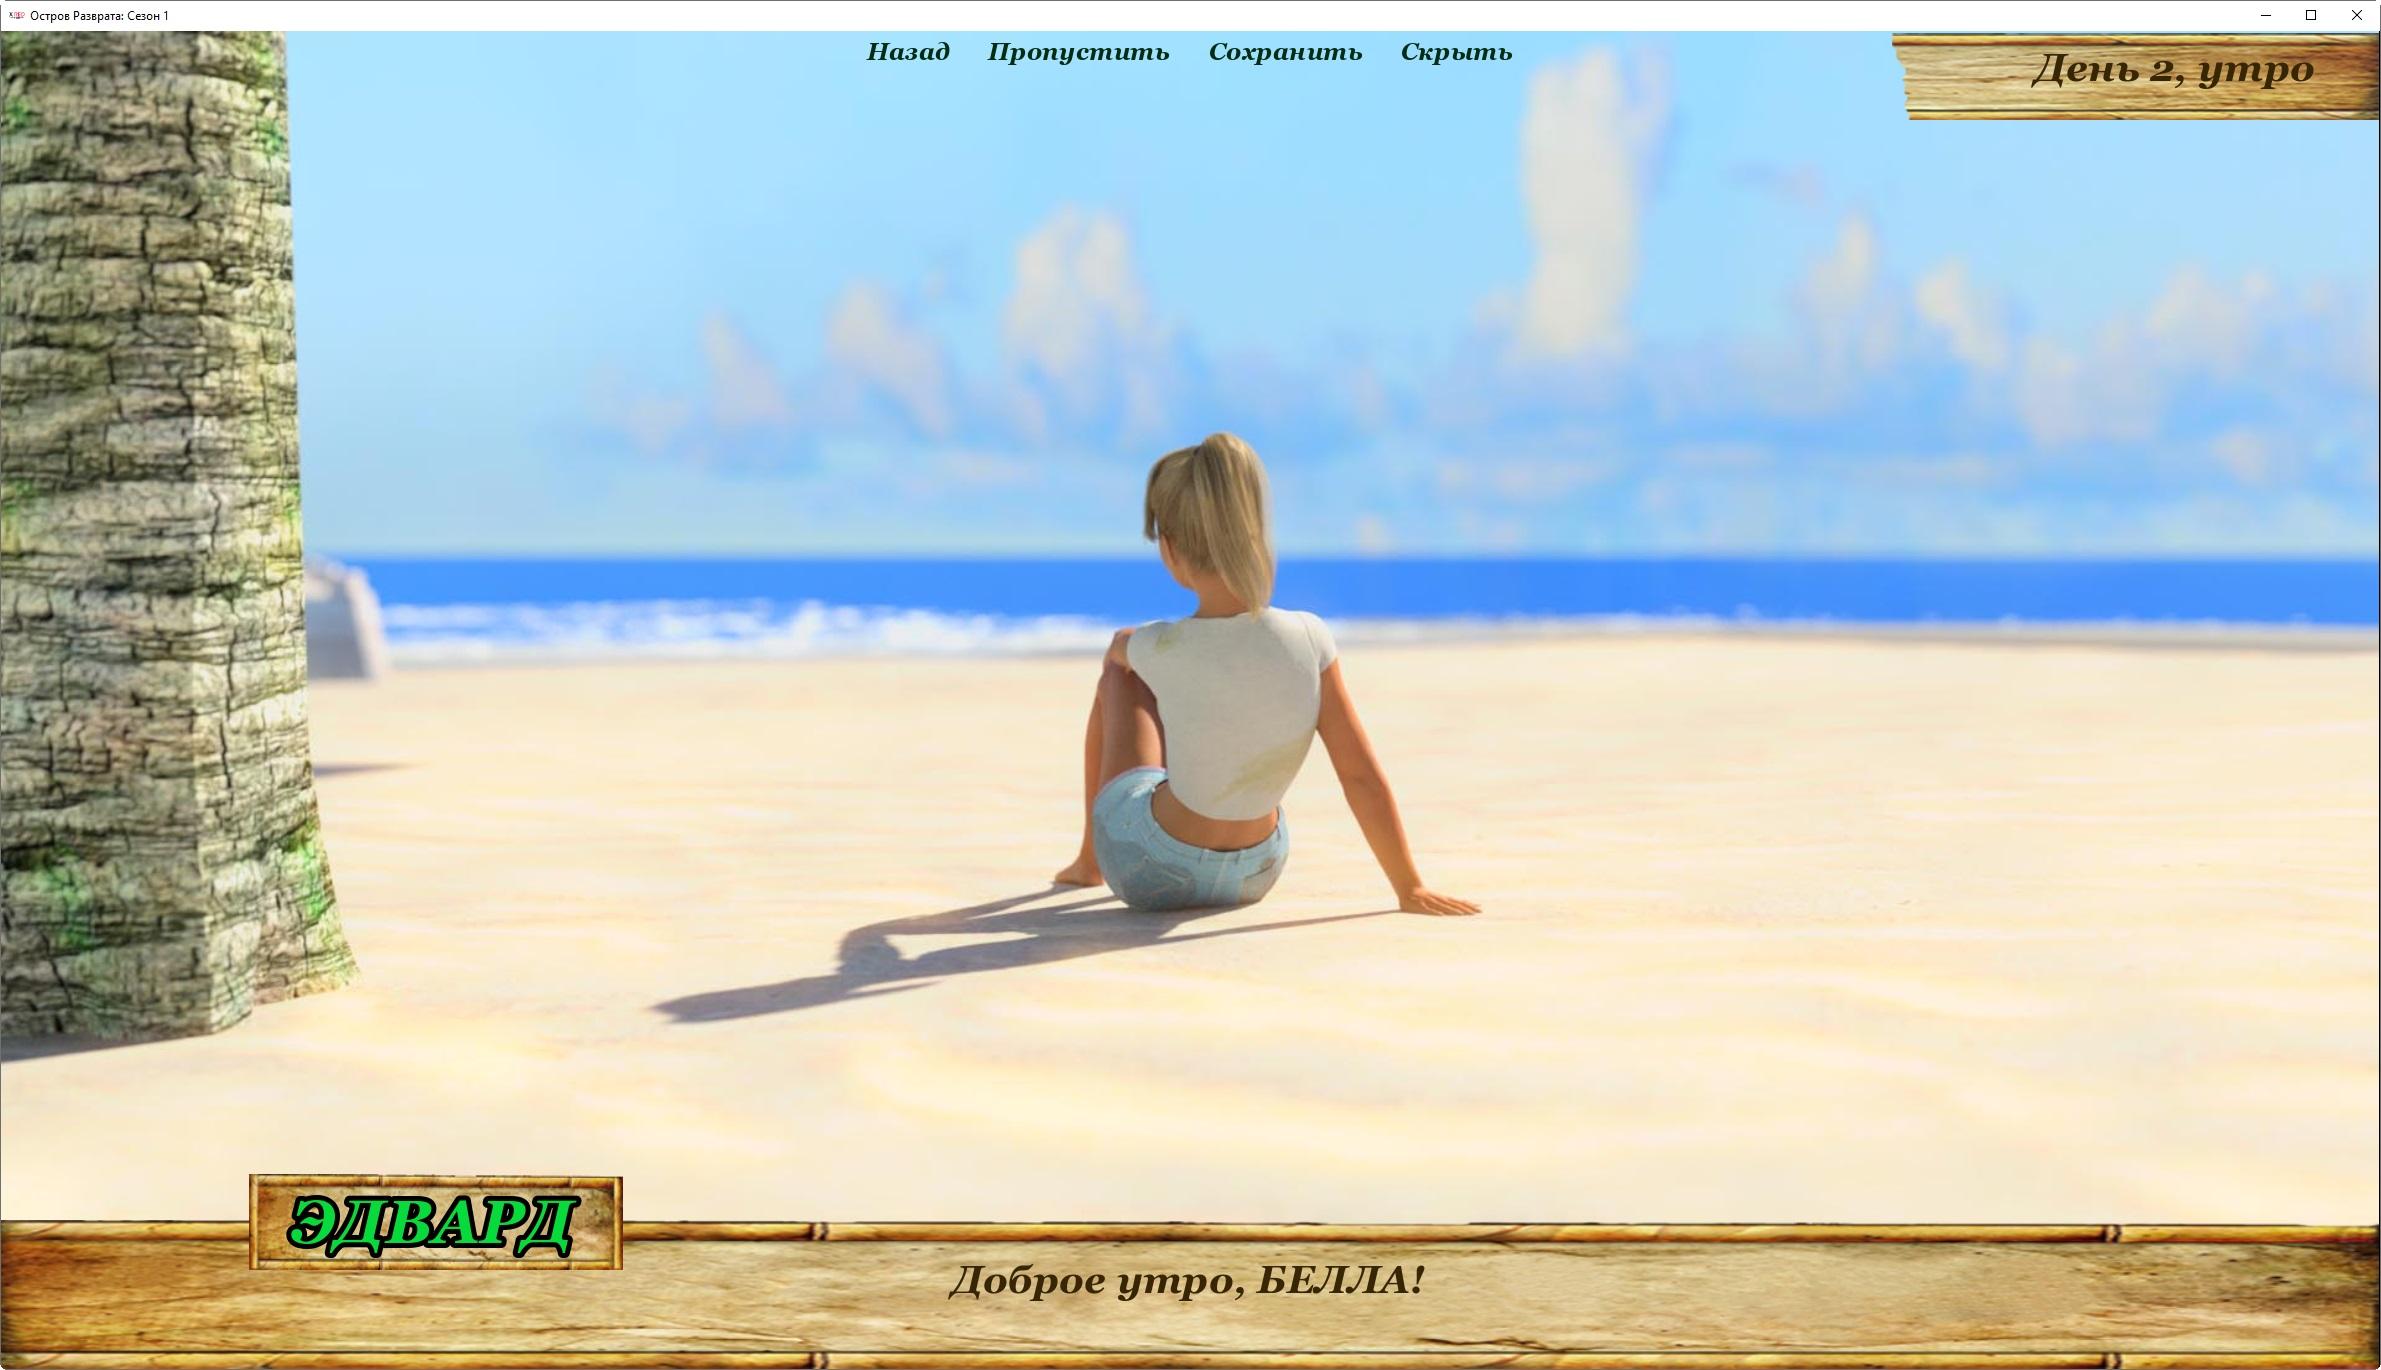 https://i6.imageban.ru/out/2021/07/15/054fd2787cff855923cbf53363618995.jpg